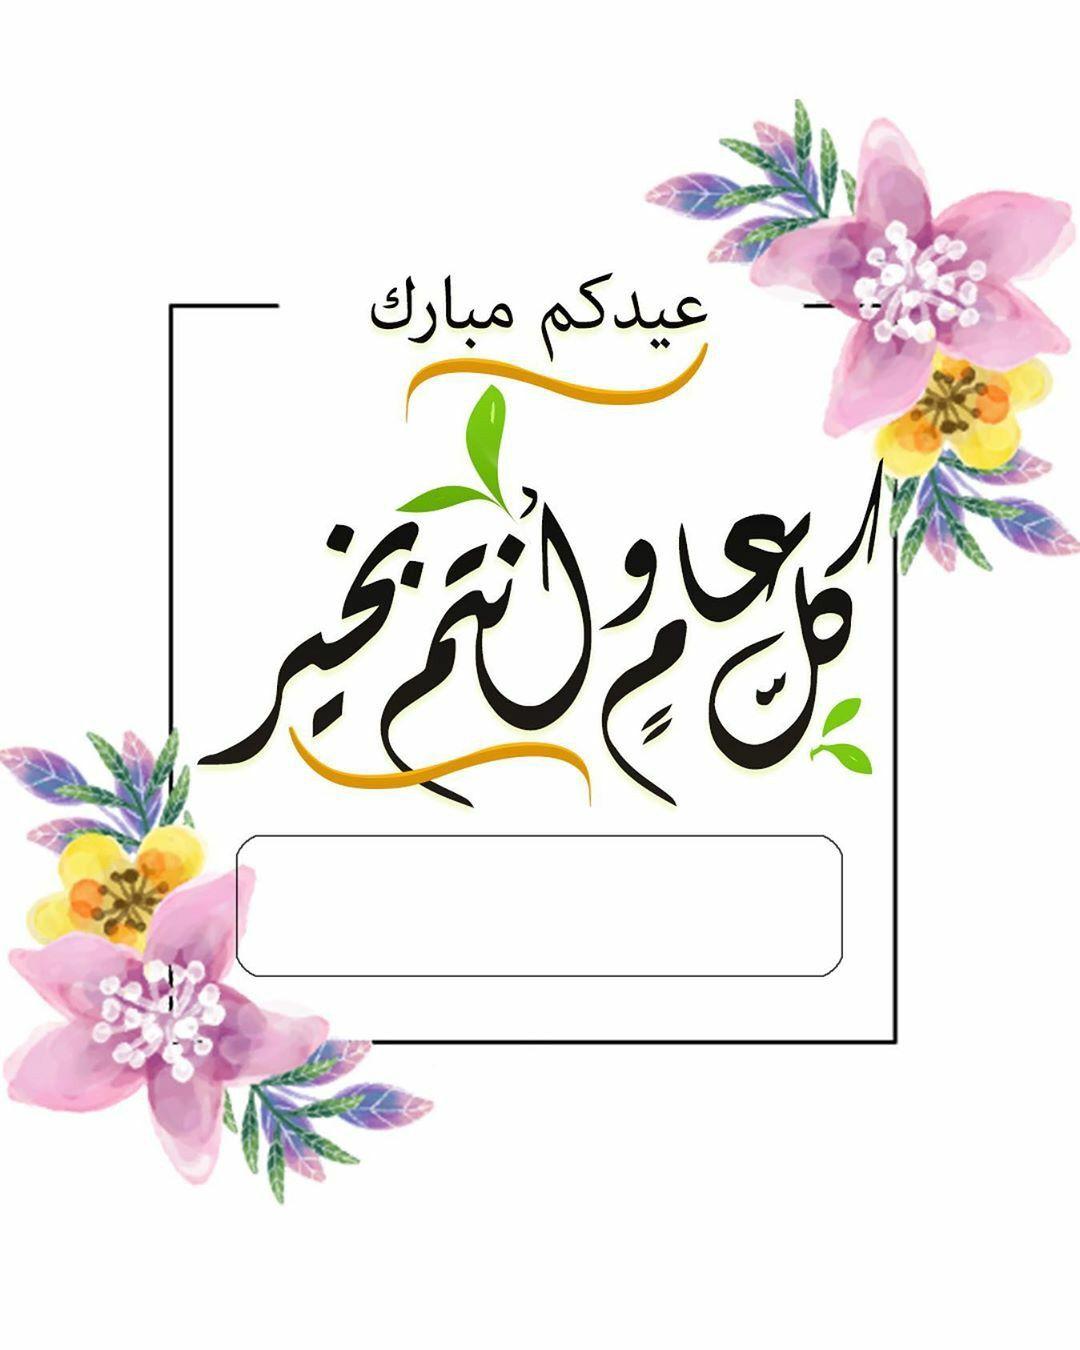 Pin By Marie Bekada On تهاني العيد الفطر المبارك لعام ١٤٤٠ Eid Card Designs Eid Greetings Eid Mubarak Greetings